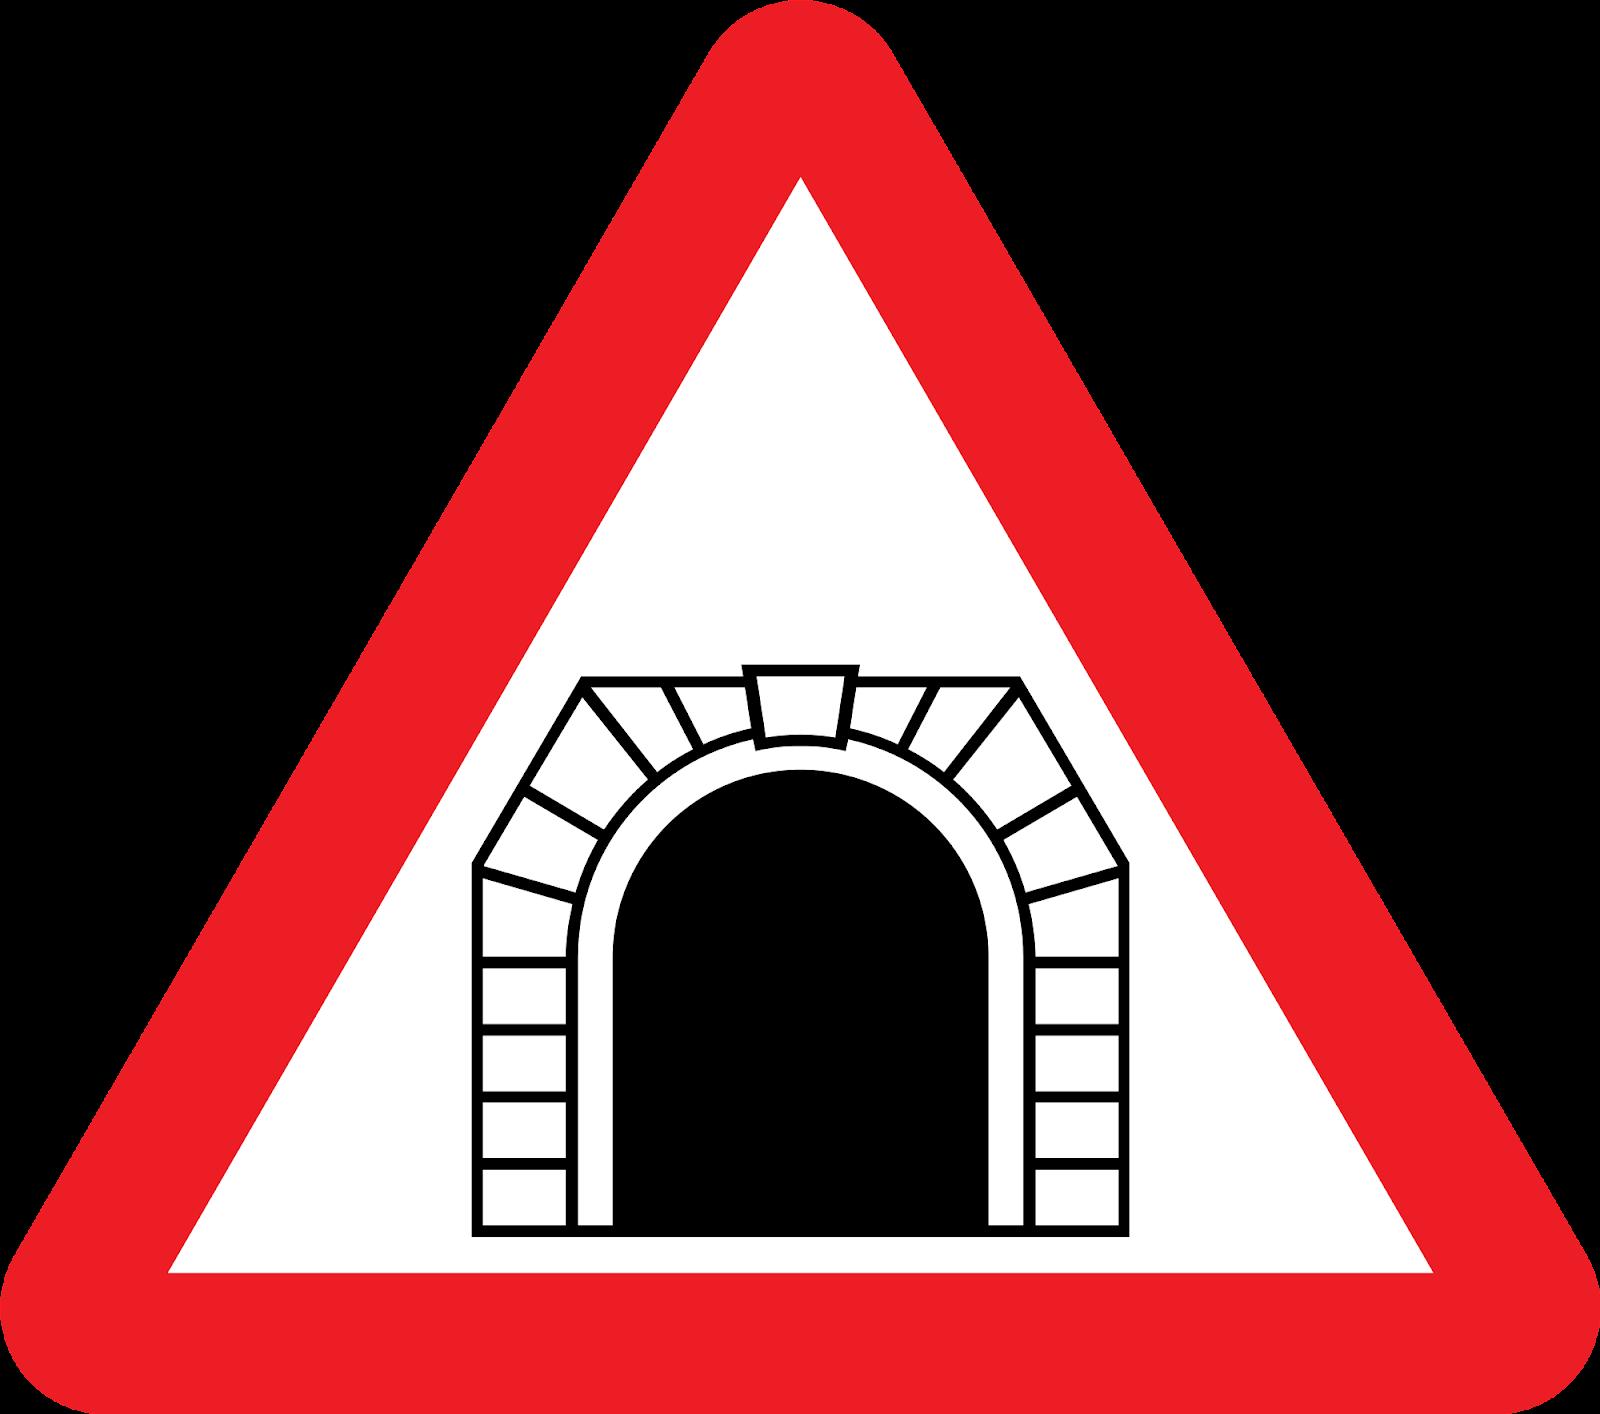 File:UK traffic sign 529.1.svg - Wikimedia Commons